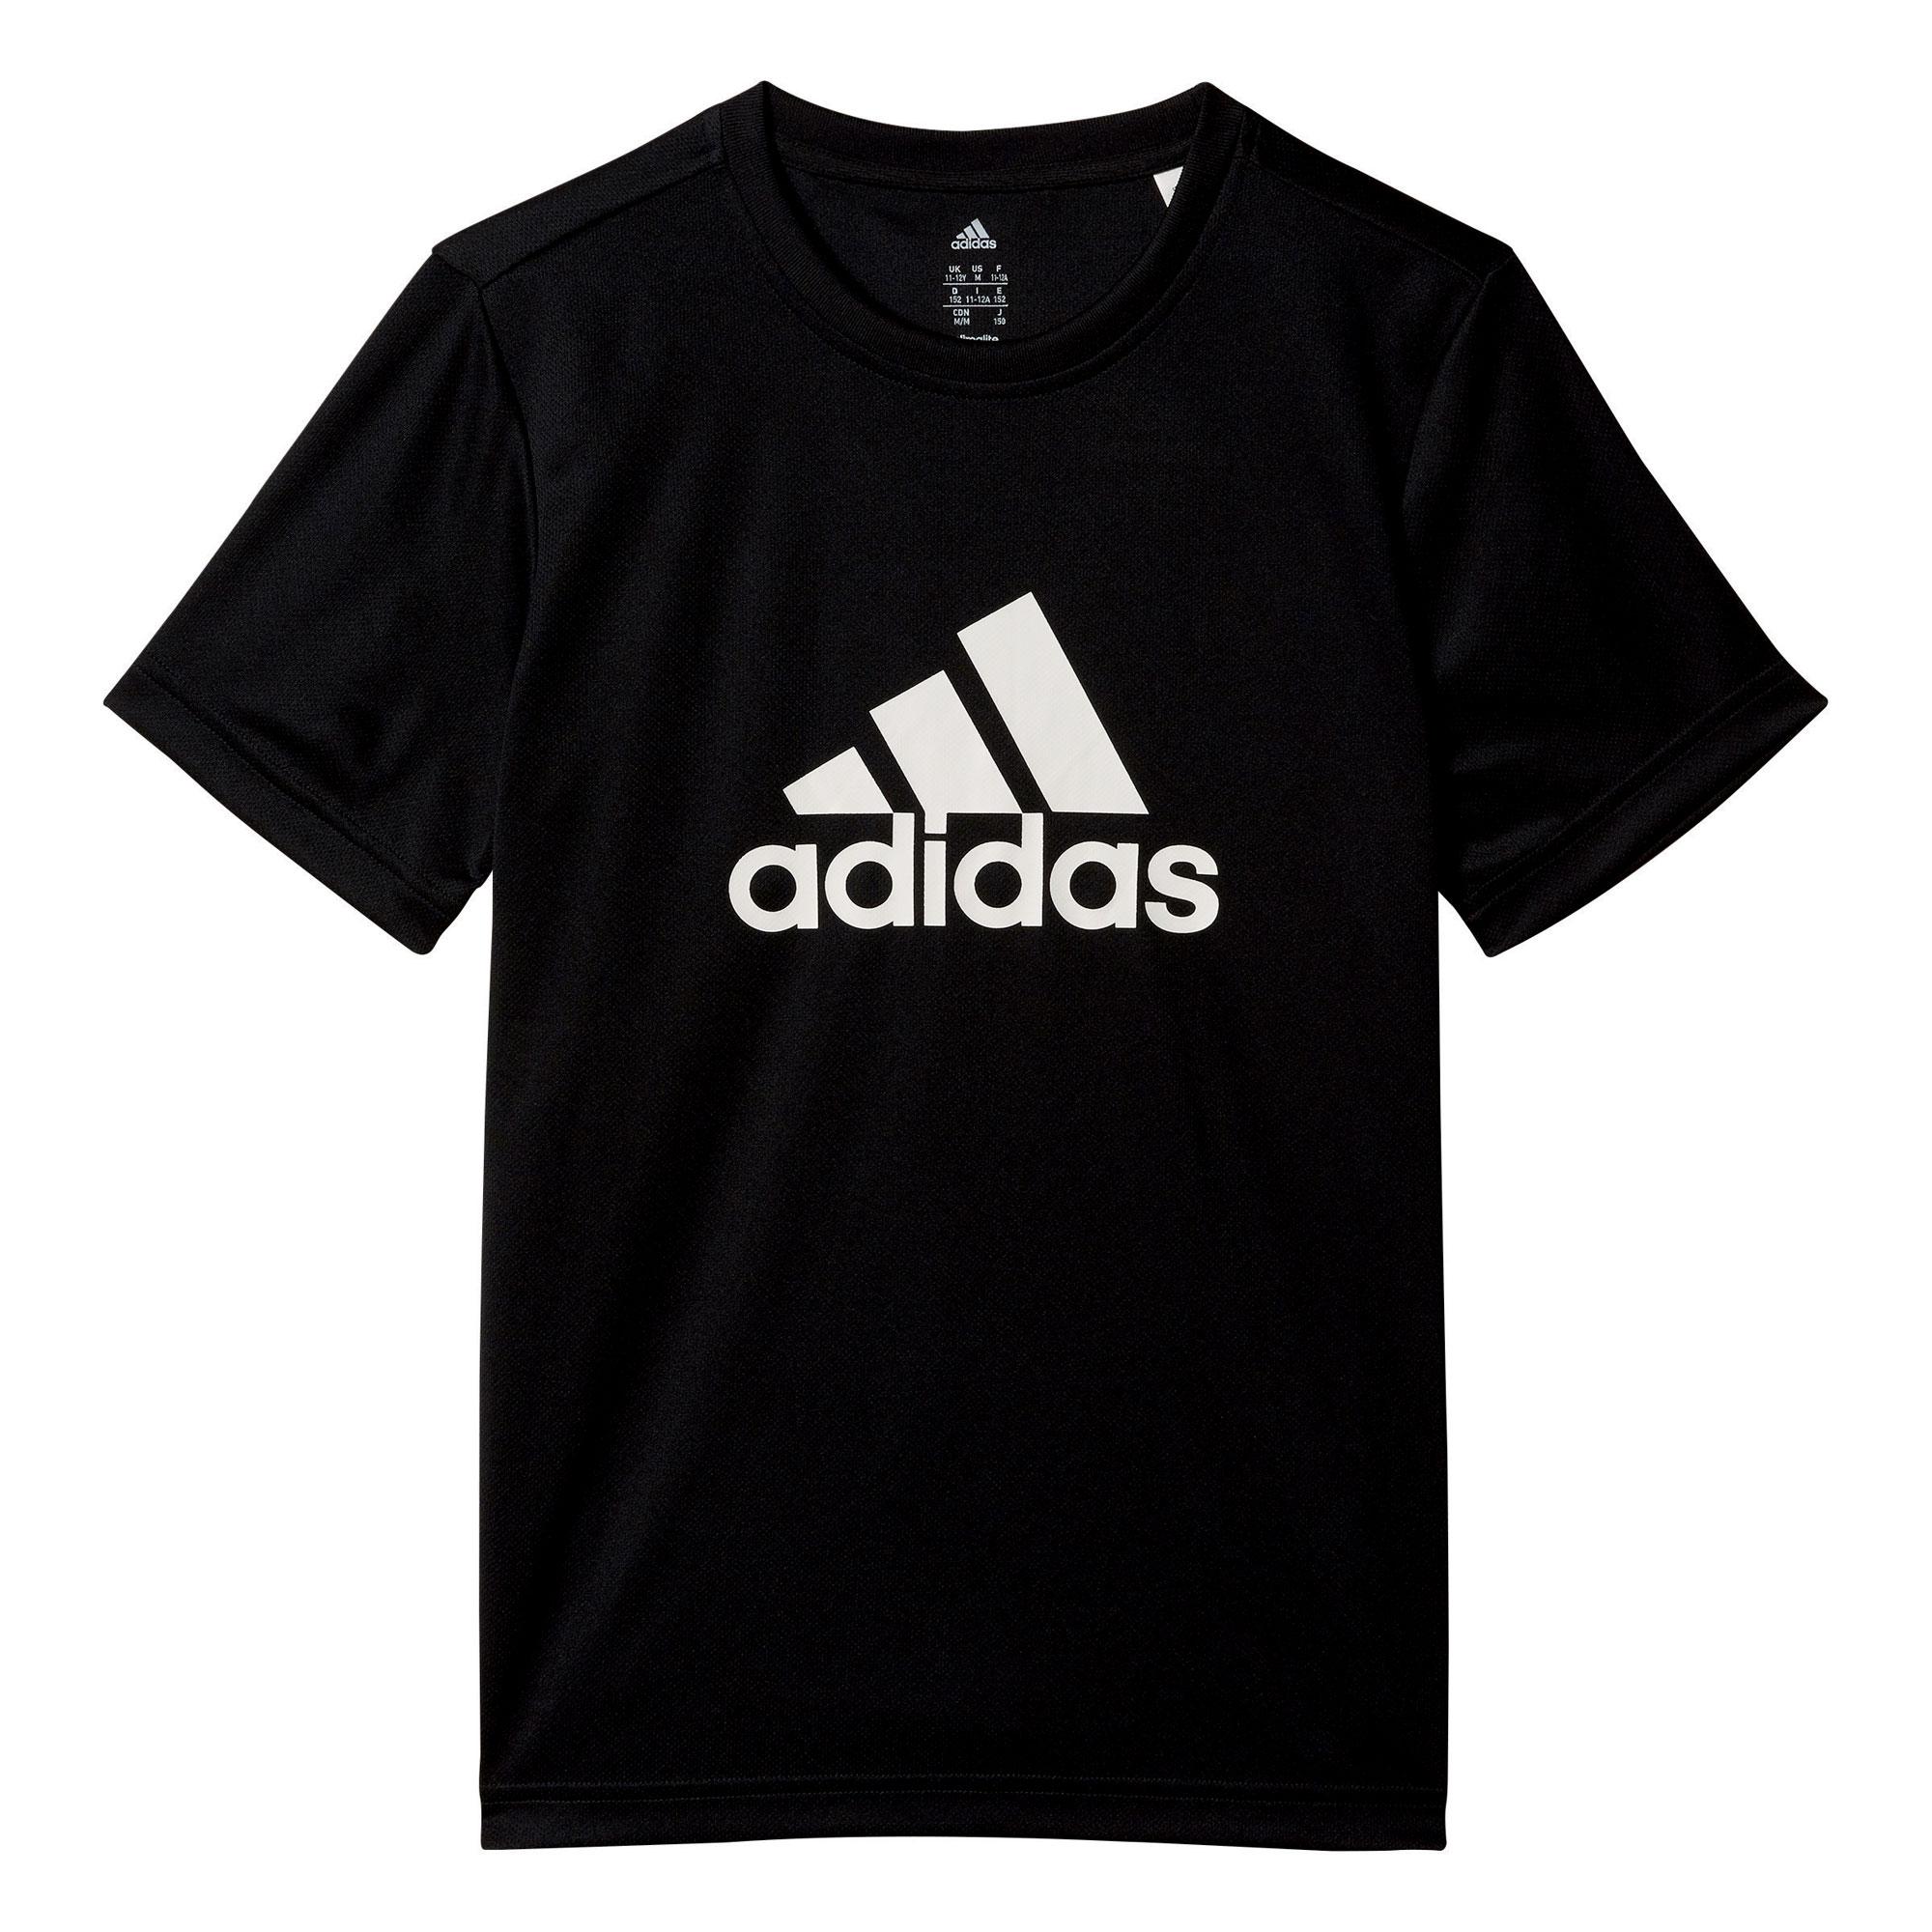 adidas Kinder T-Shirt Gear Up Tee BK0707 110